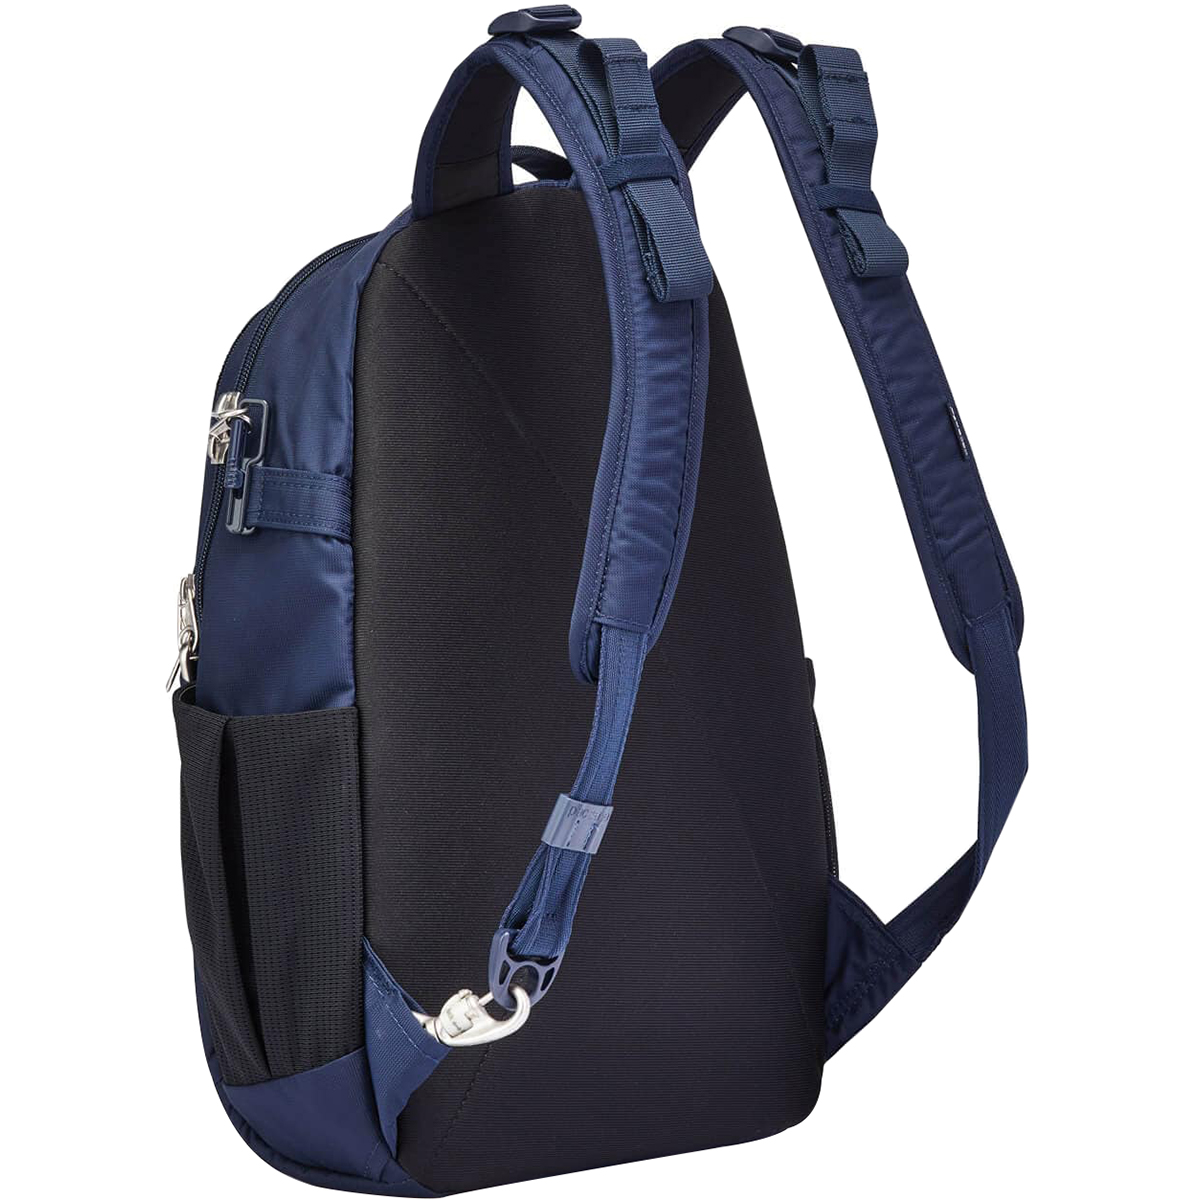 PacSafe-MetroSafe-LS350-Anti-Theft-15L-Backpack miniature 7